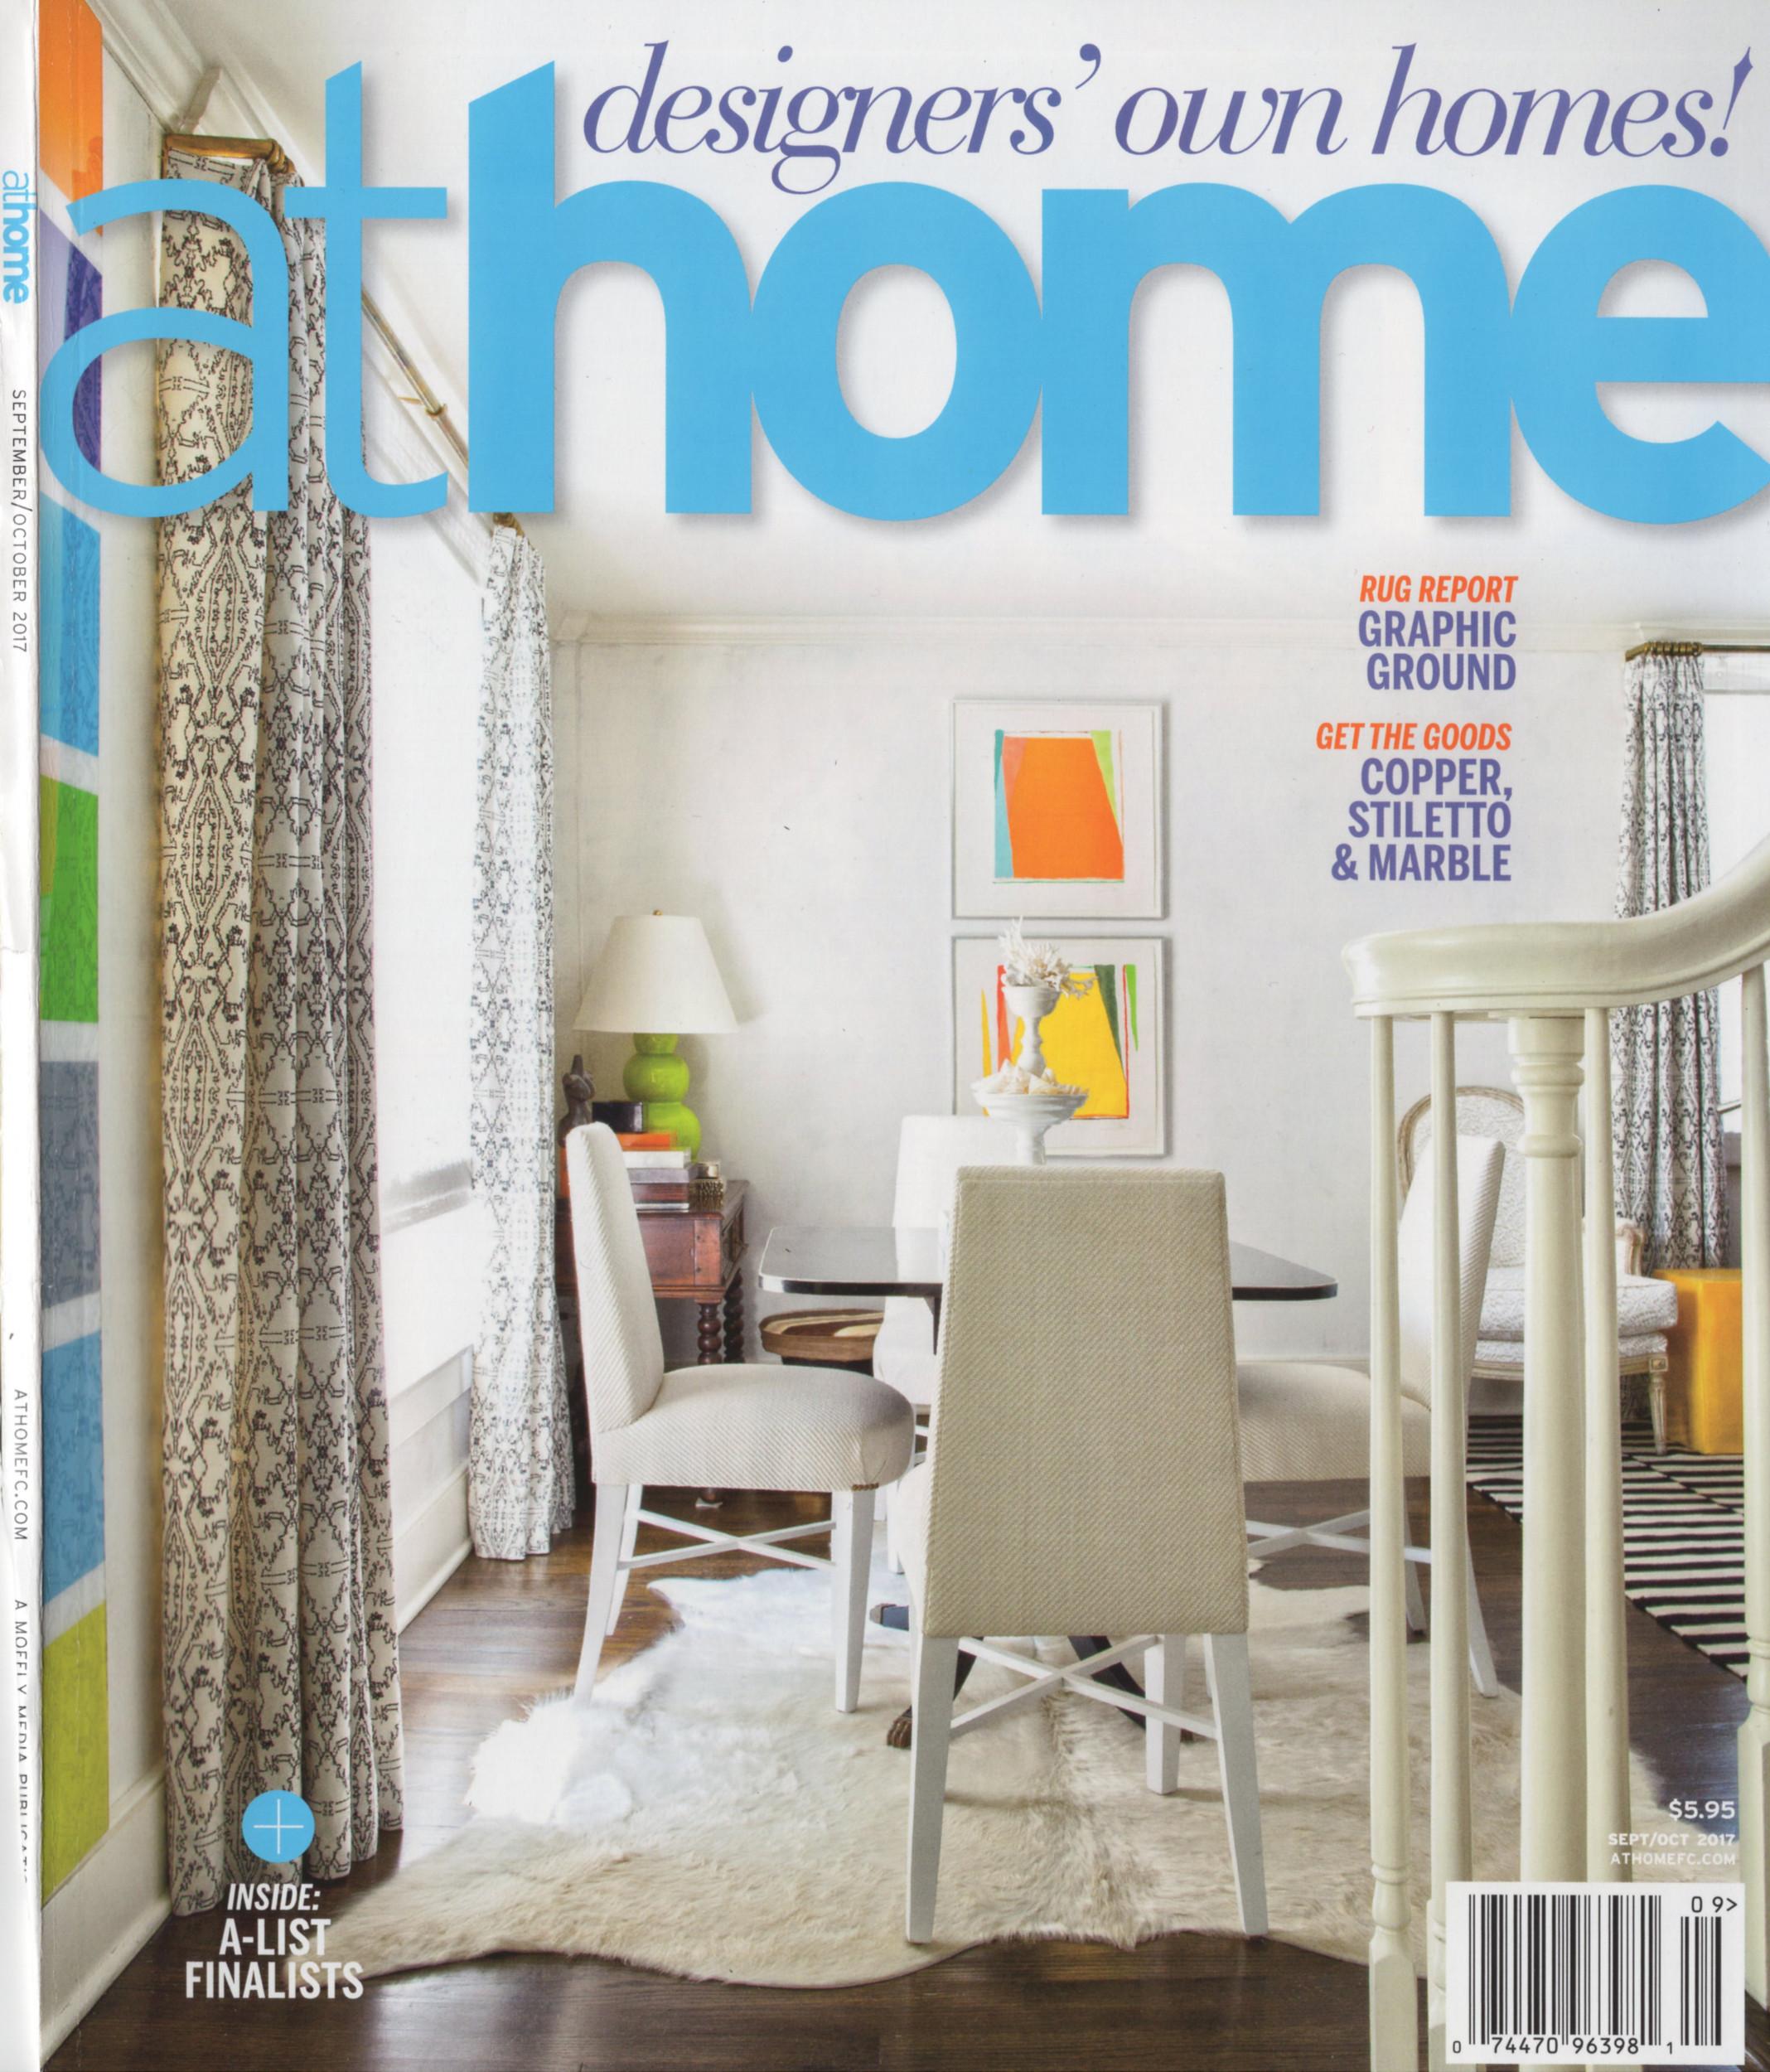 Caroline Kopp Interior Design AtHome Magazine Cover Rowayton CT Connecticut Interior Designers.JPG